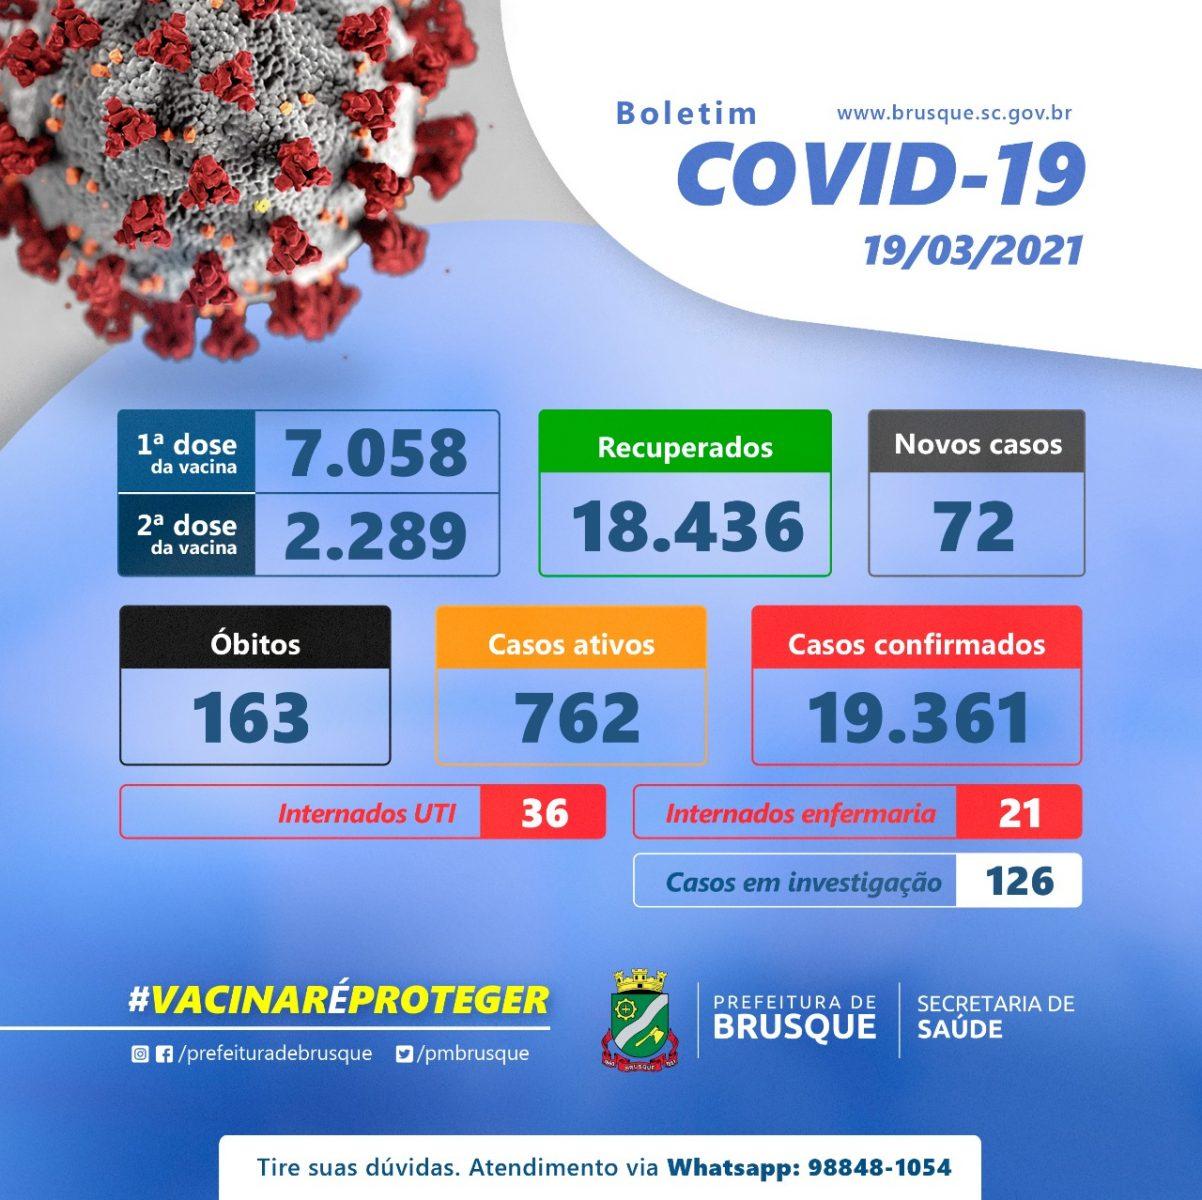 Covid-19: Confira o boletim epidemiológico desta sexta-feira (19)